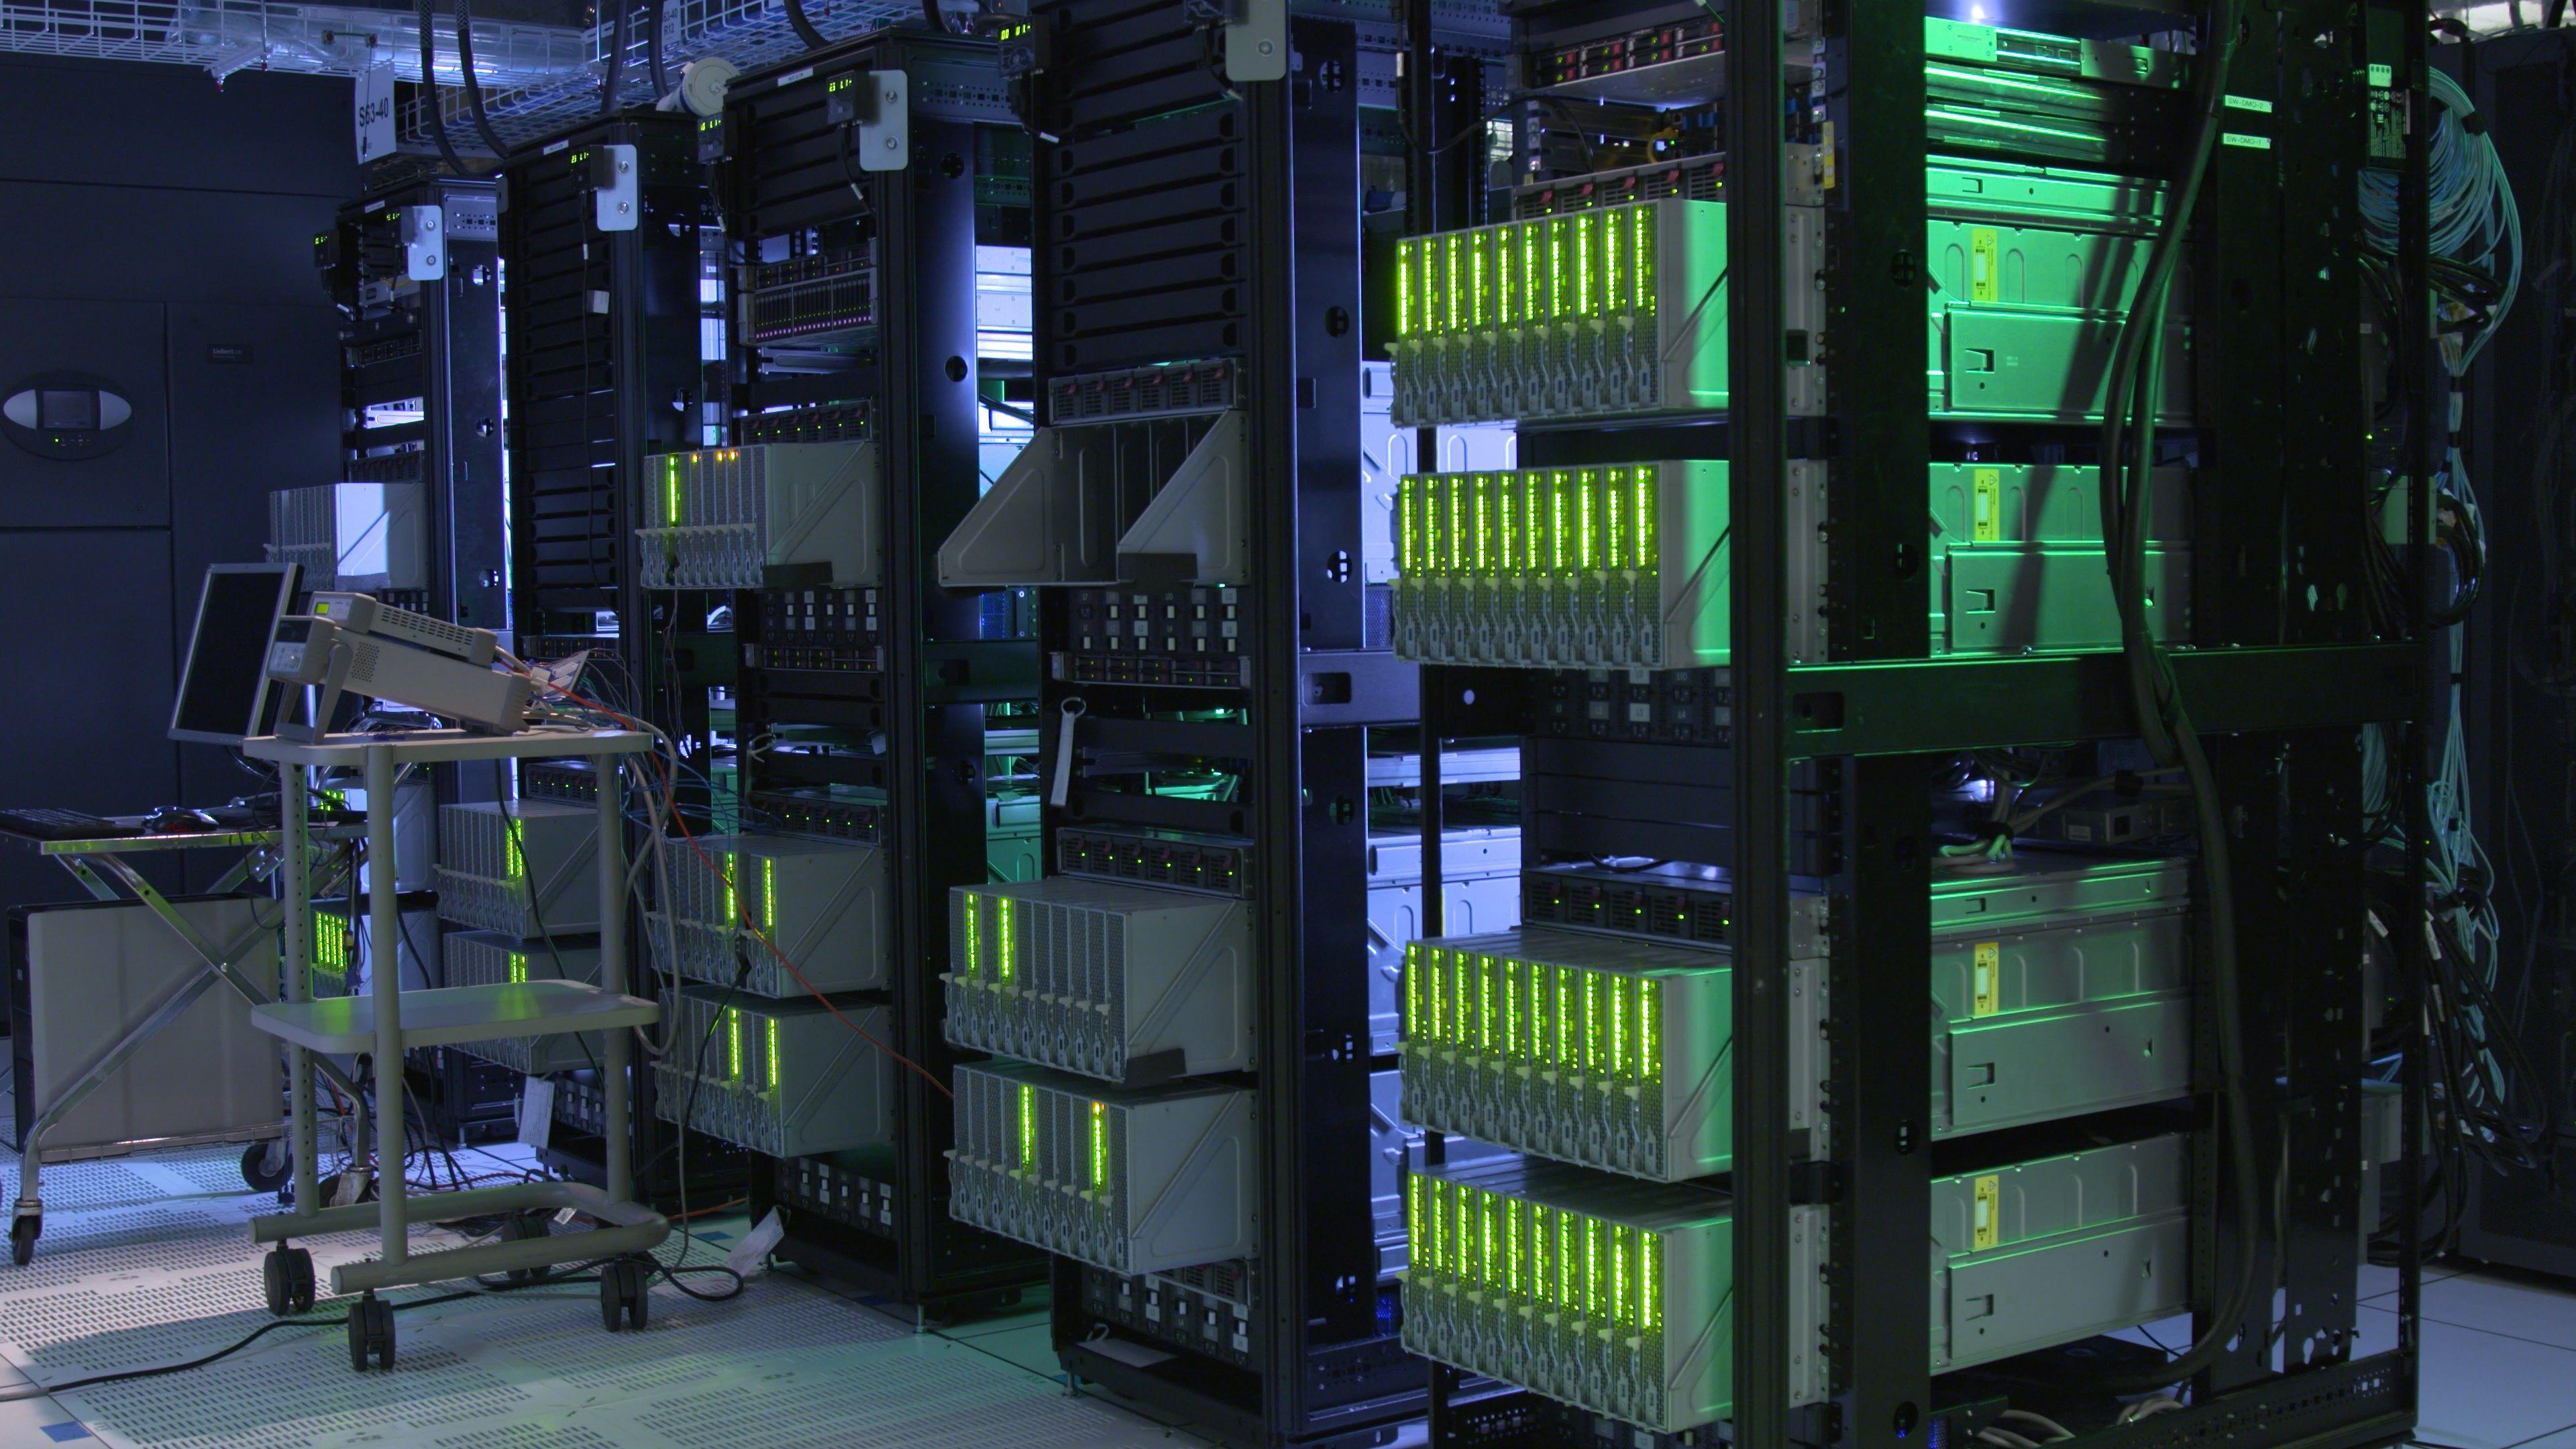 HPE zeigt den Prototypen eines radikal neuen Computers in den Hewlett Packard Labs.